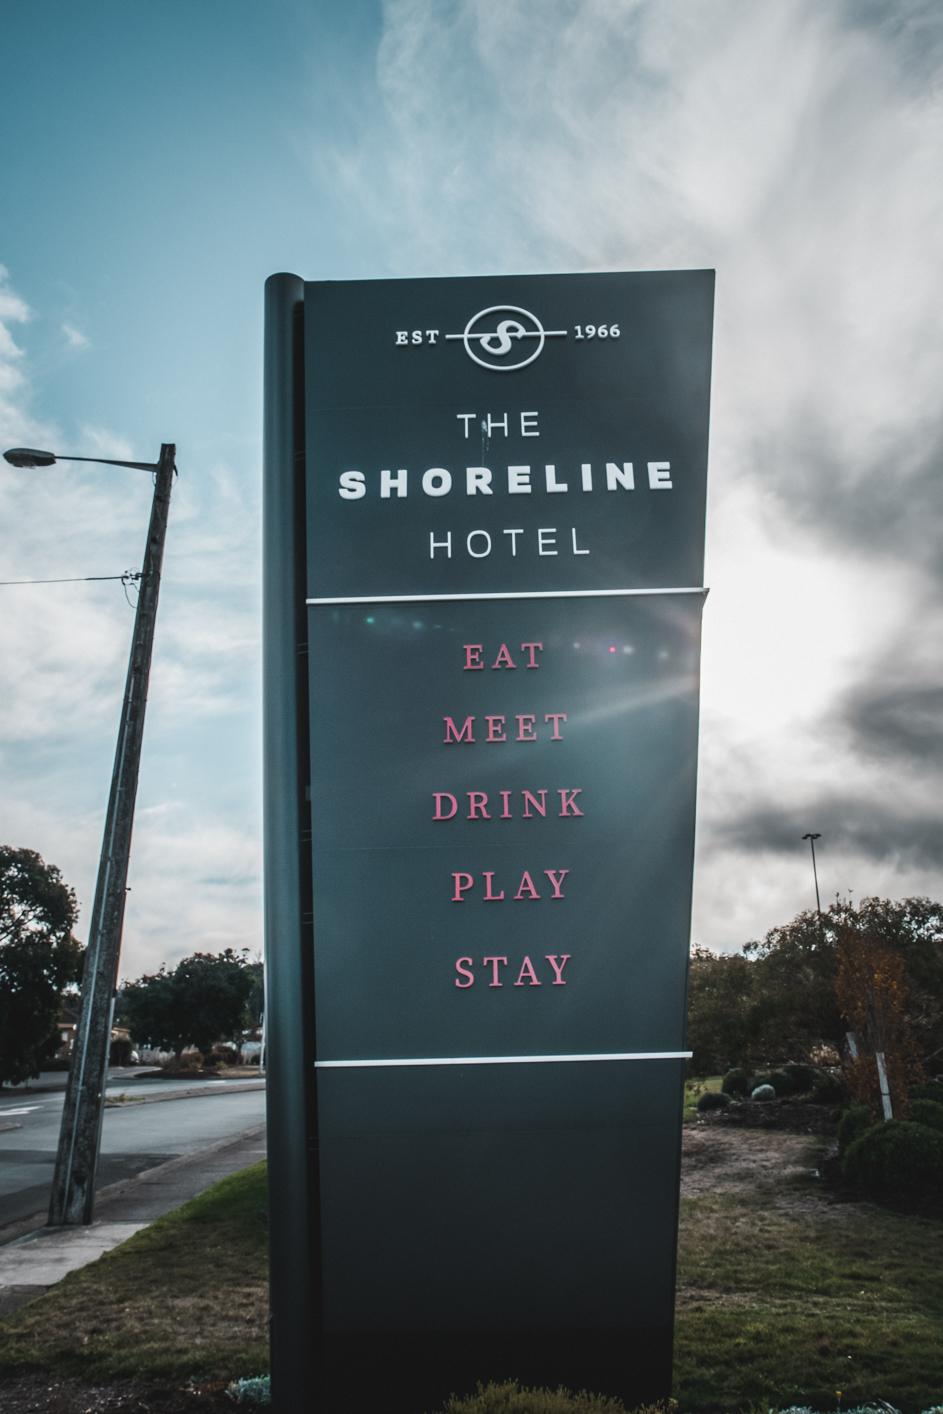 Shoreline (Web) (50 of 50).jpg